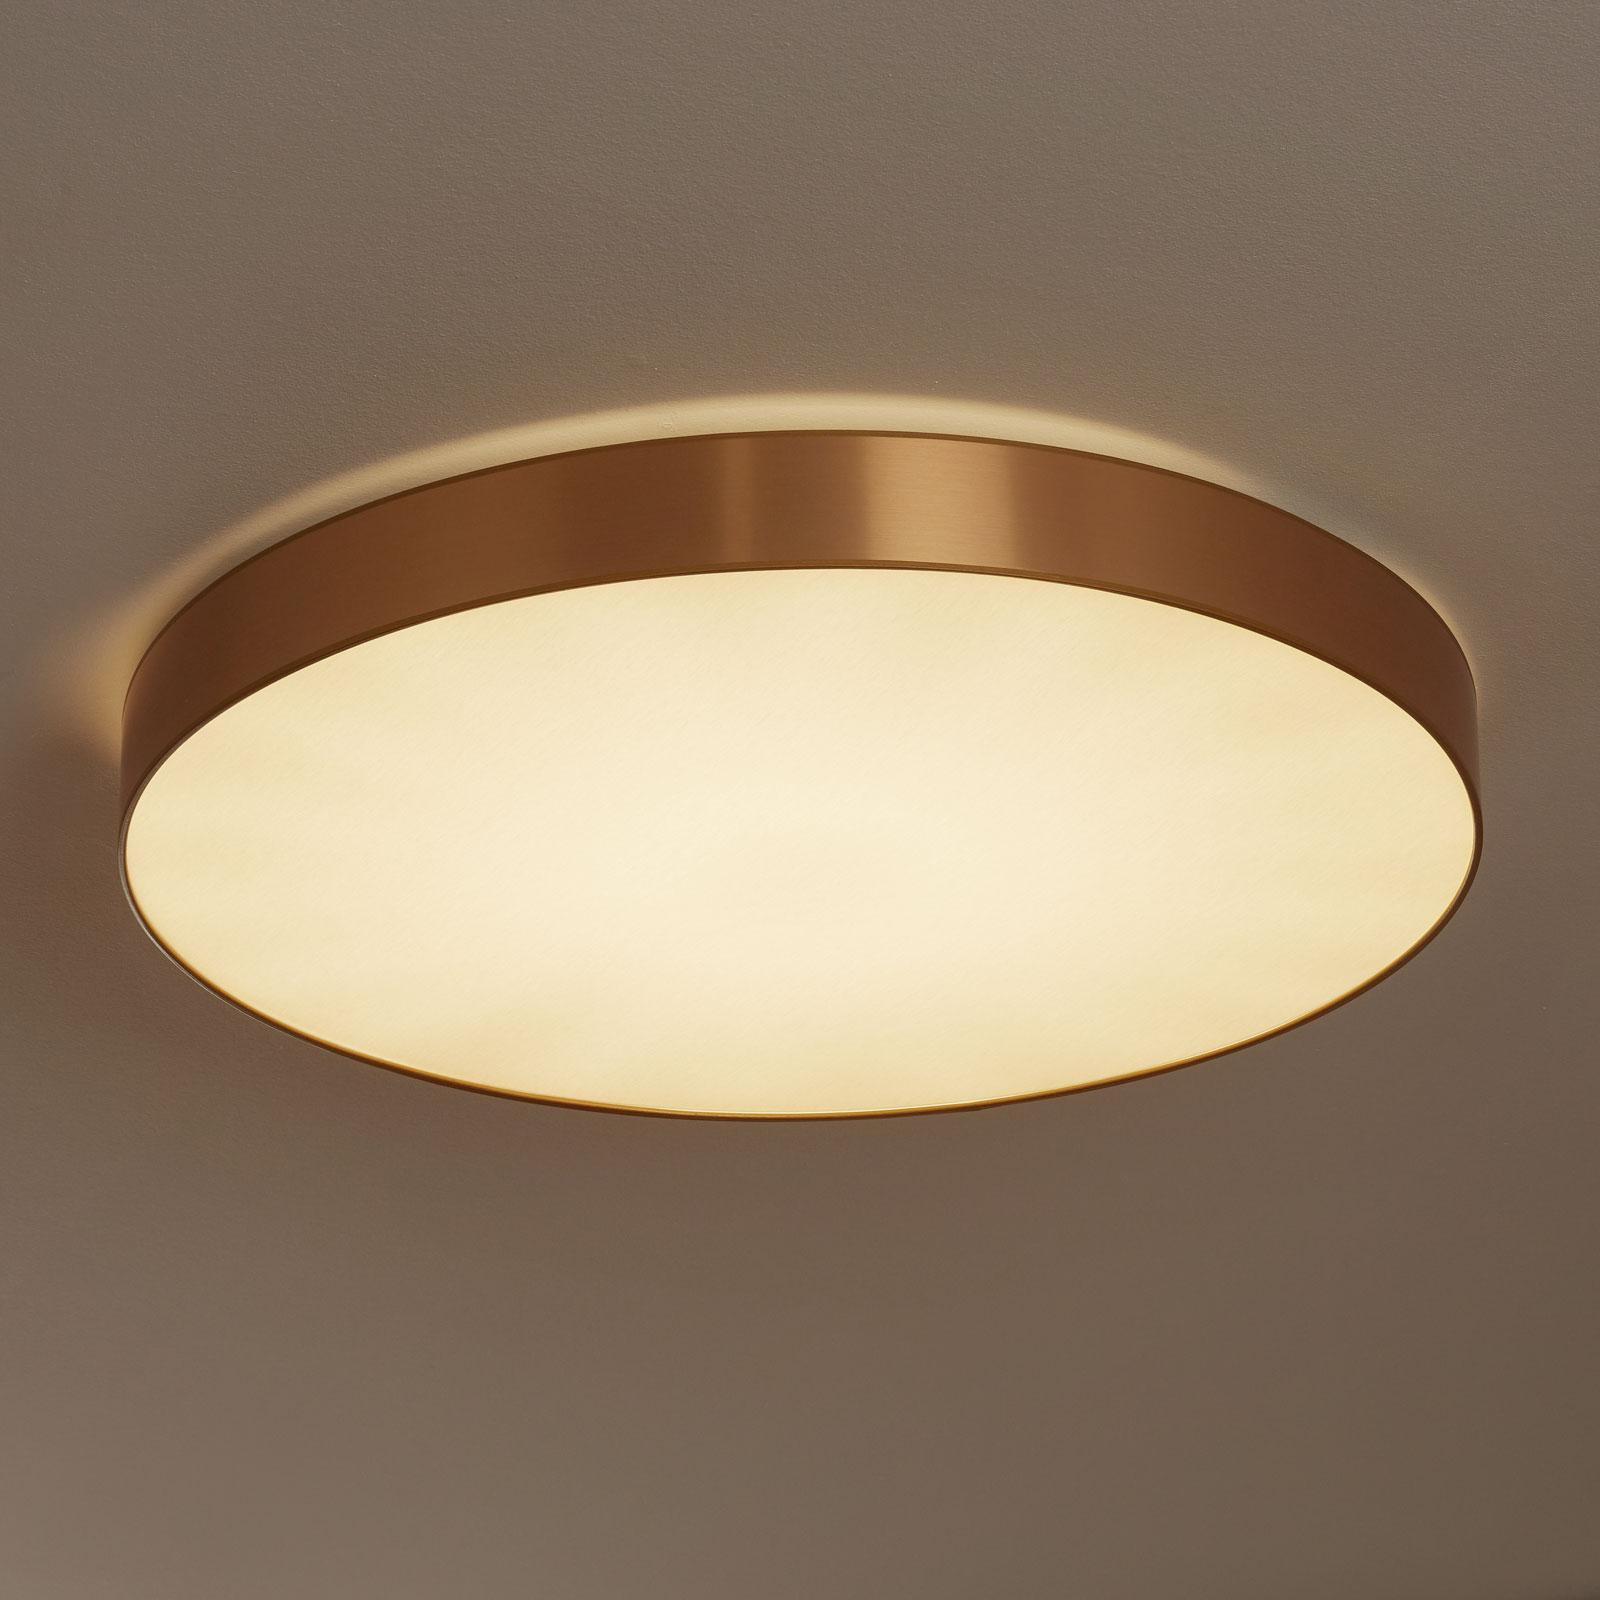 Aurelias taklampe dimbar 78 cm gullfarget